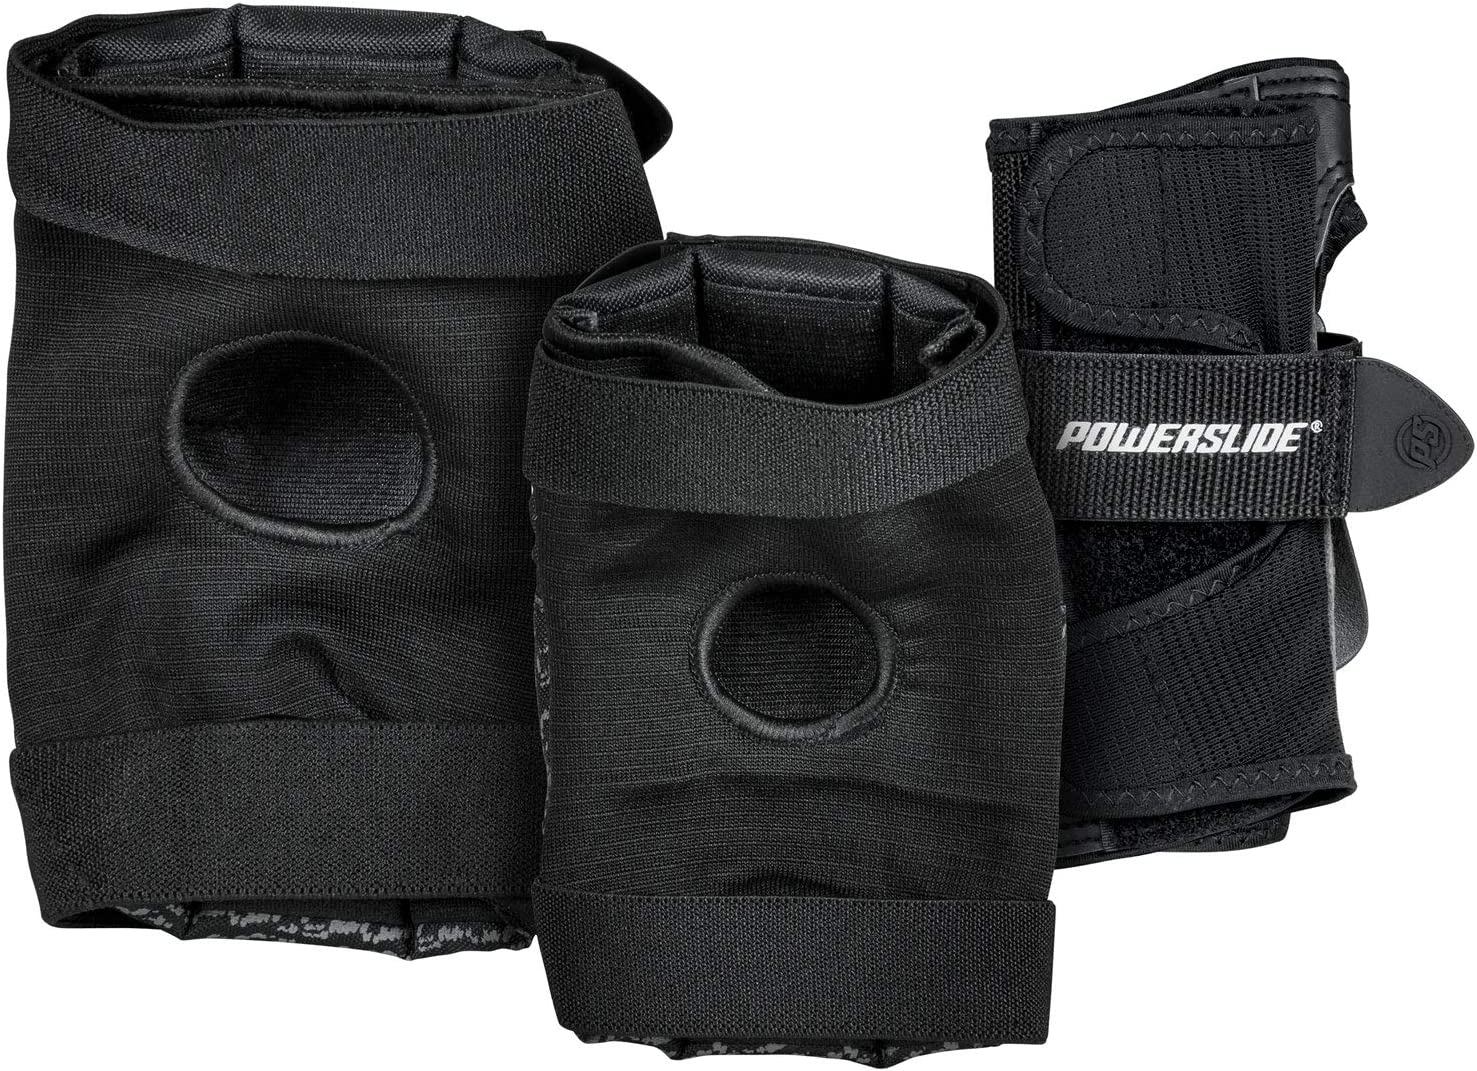 Powerslide Standard Women Guards Protectors Pads Pack of 3/Set of 3